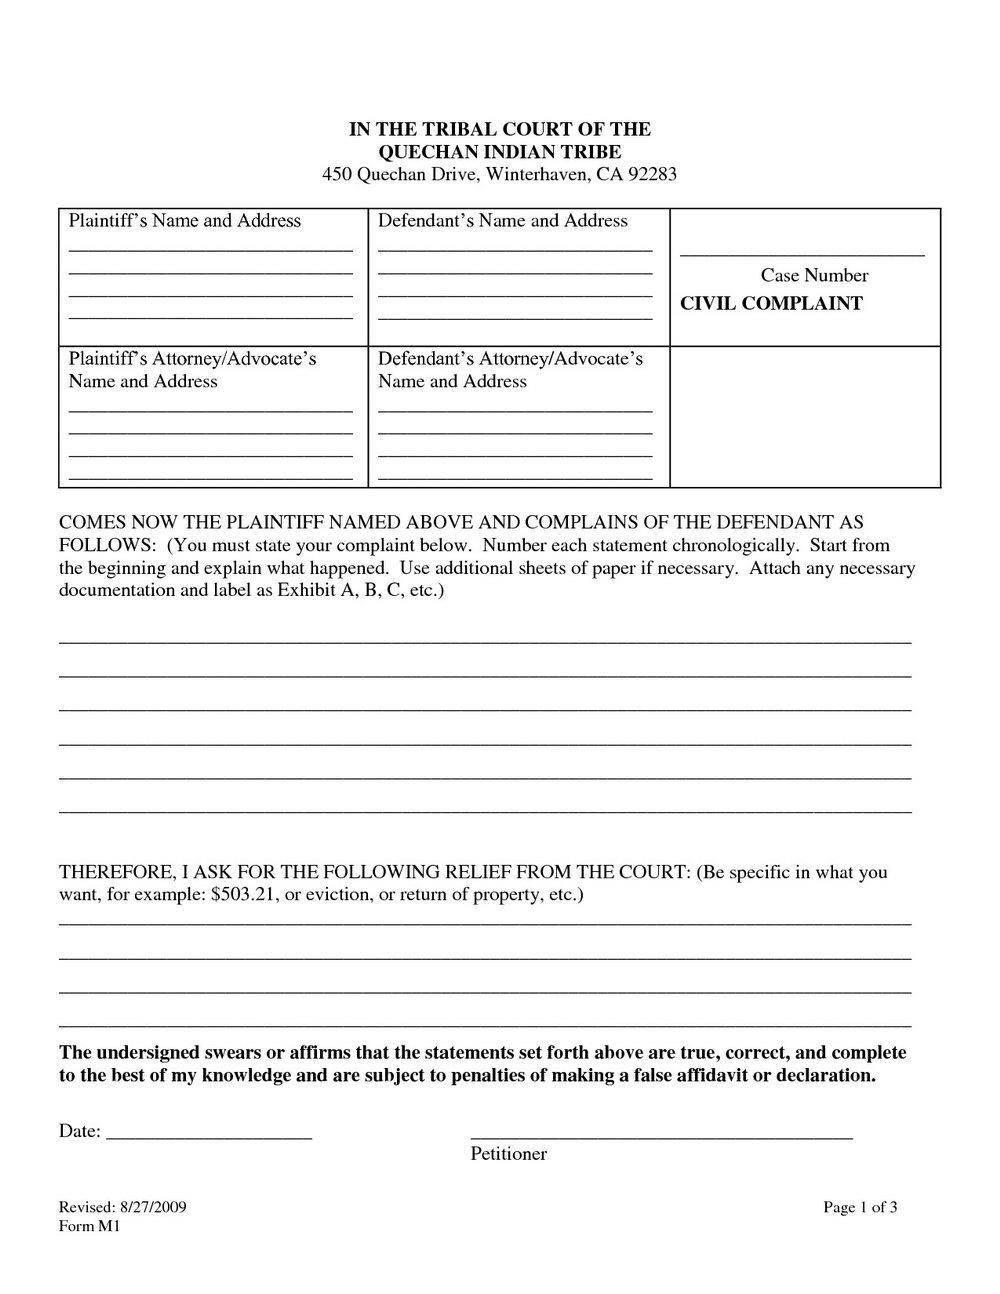 North Carolina Divorce Forms Mecklenburg County